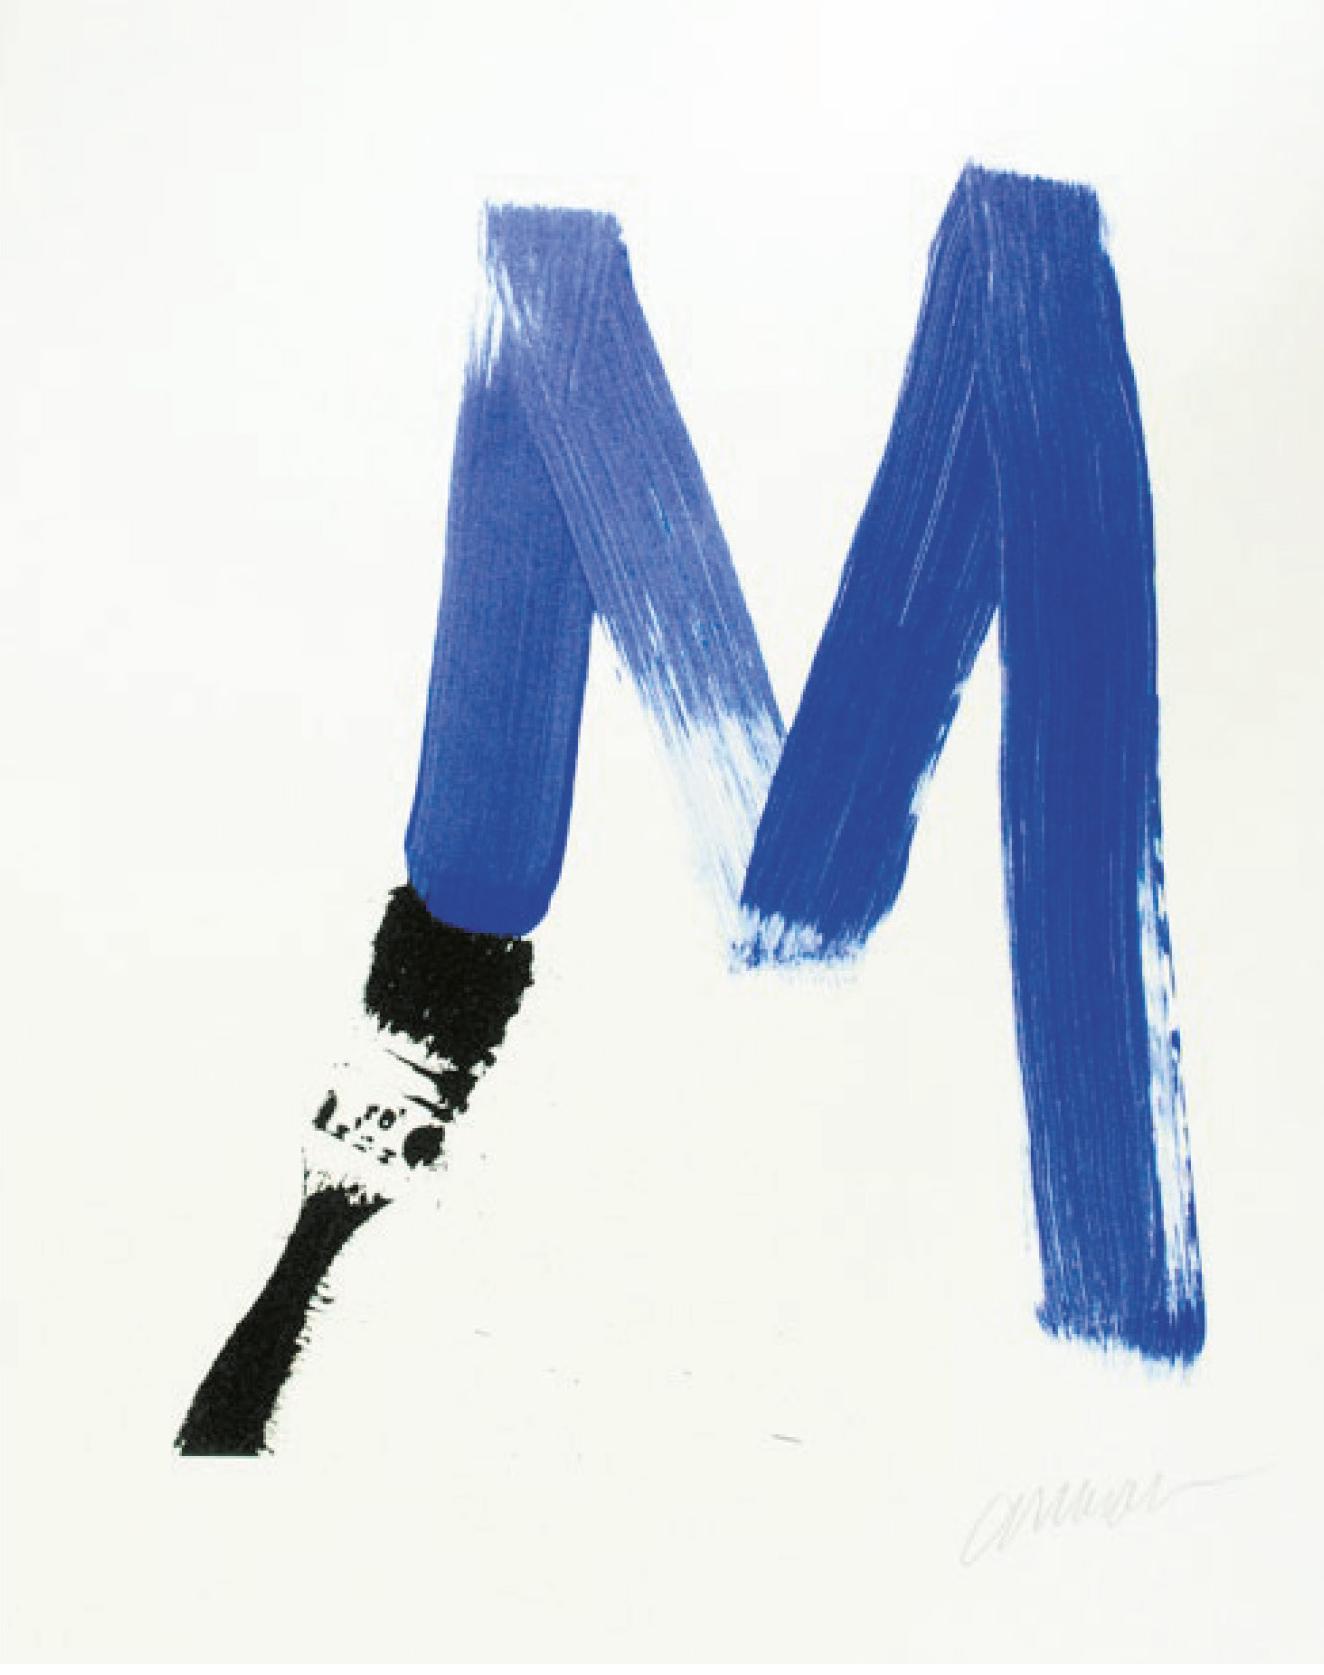 Lot 72 - ARMAN Fernandez (1928-2005) Untitled, 2005 - 50 x 40 cm - Serigraph Signed on lower [...]